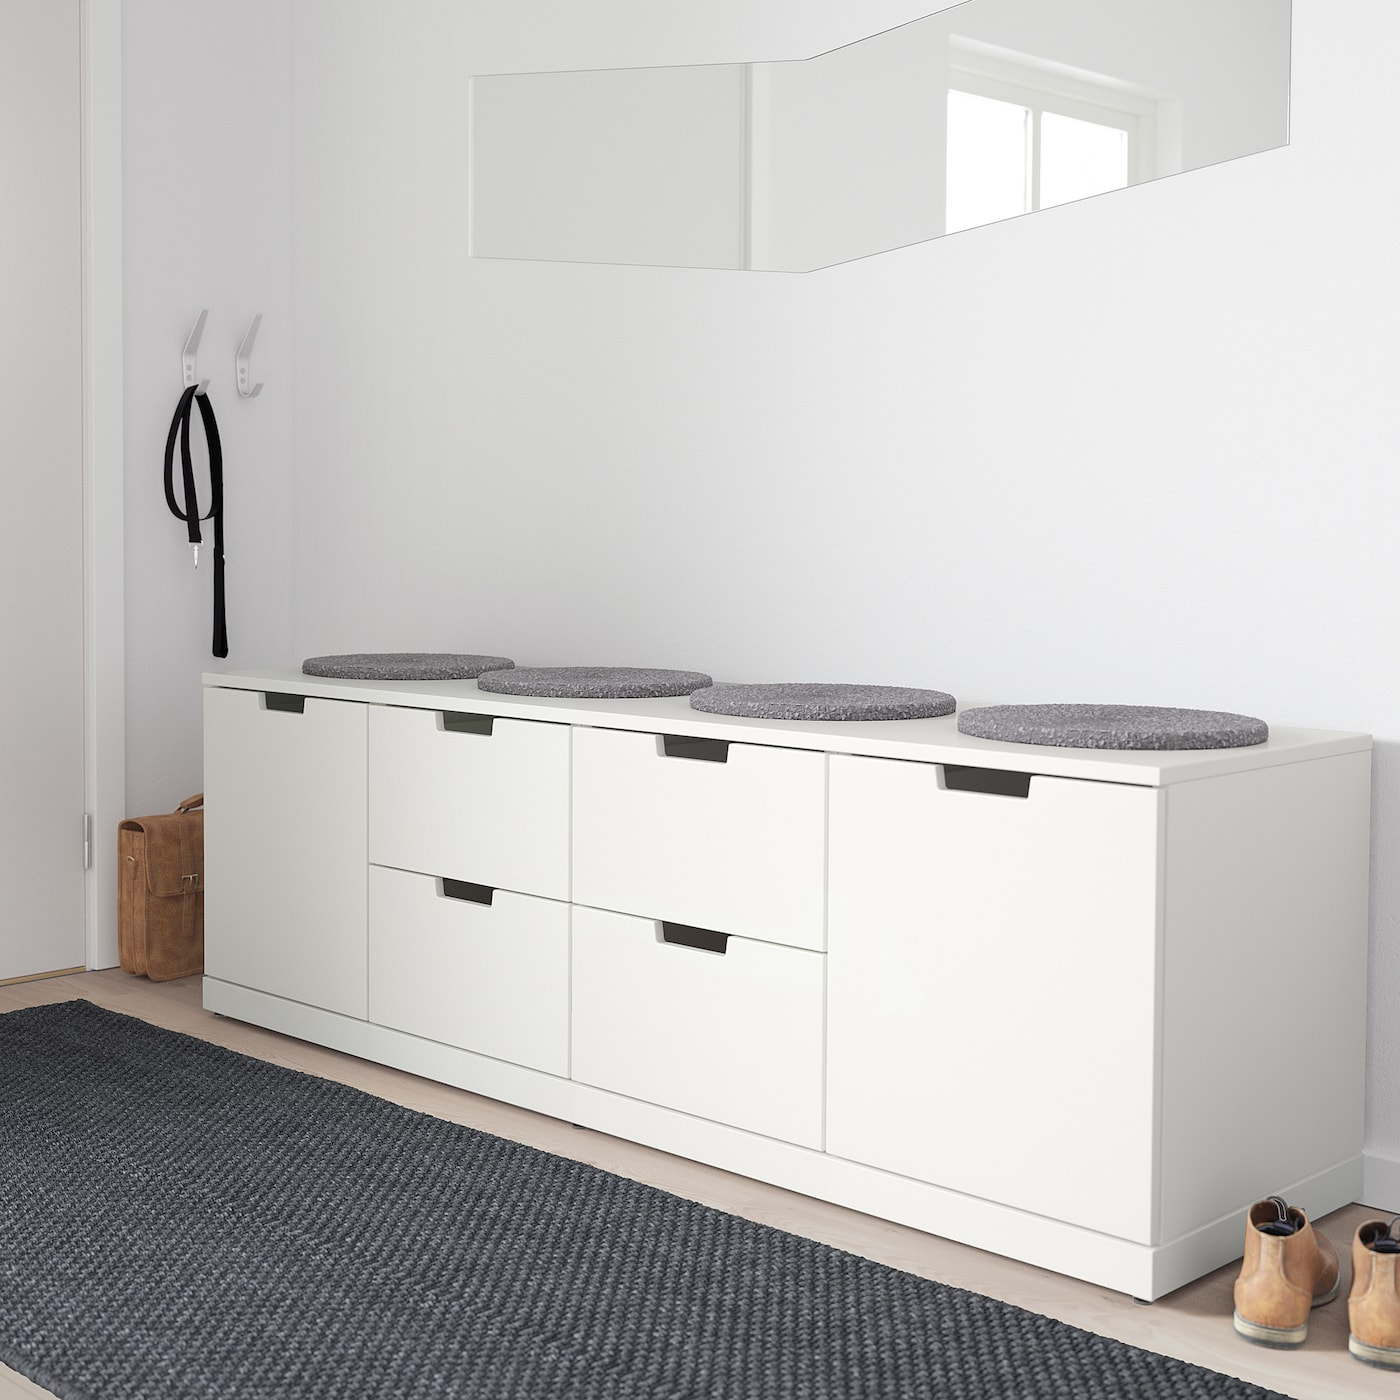 Ikea Kommode 60 Cm Breit 2021